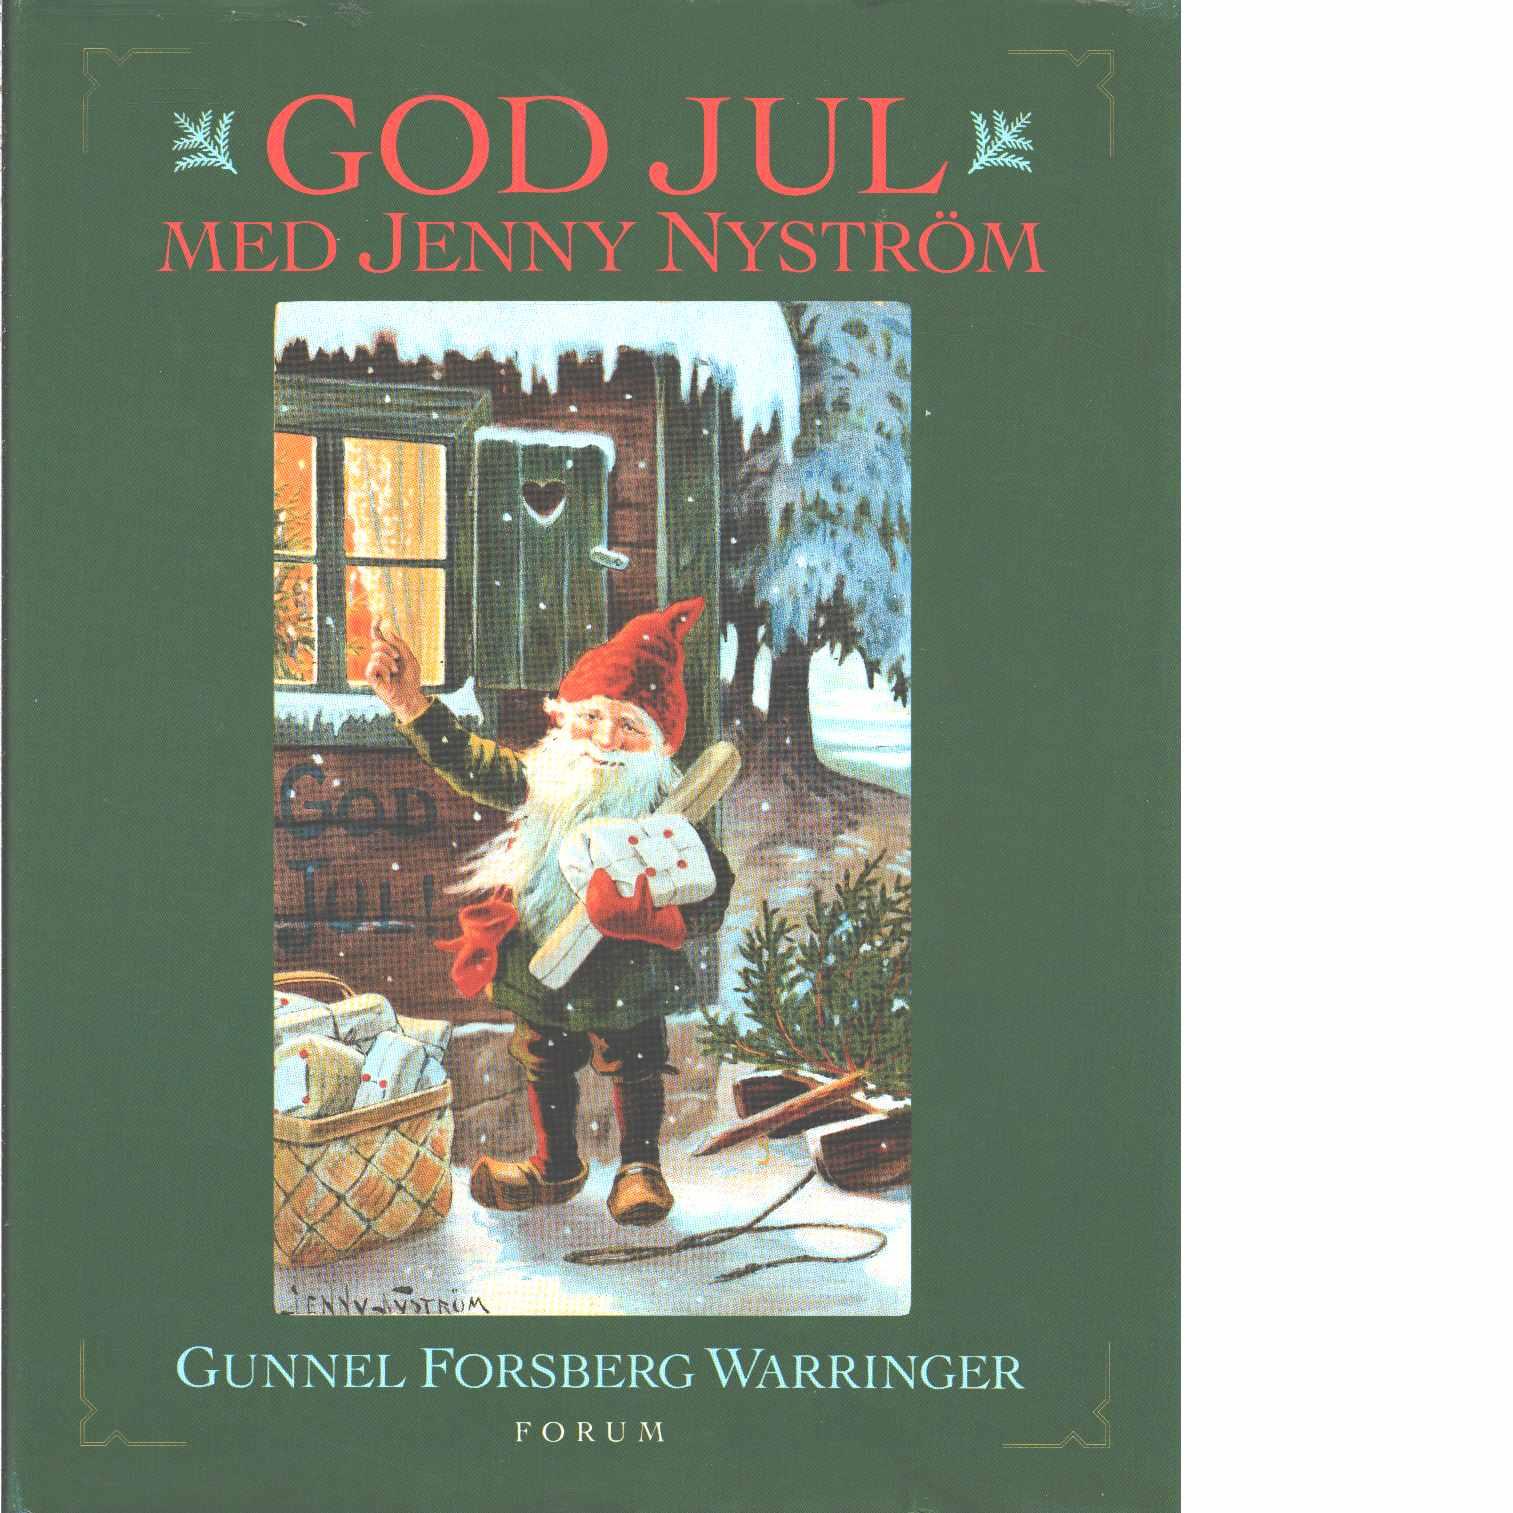 God jul med Jenny Nyström  - Forsberg Warringer, Gunnel och  Nyström, Jenny